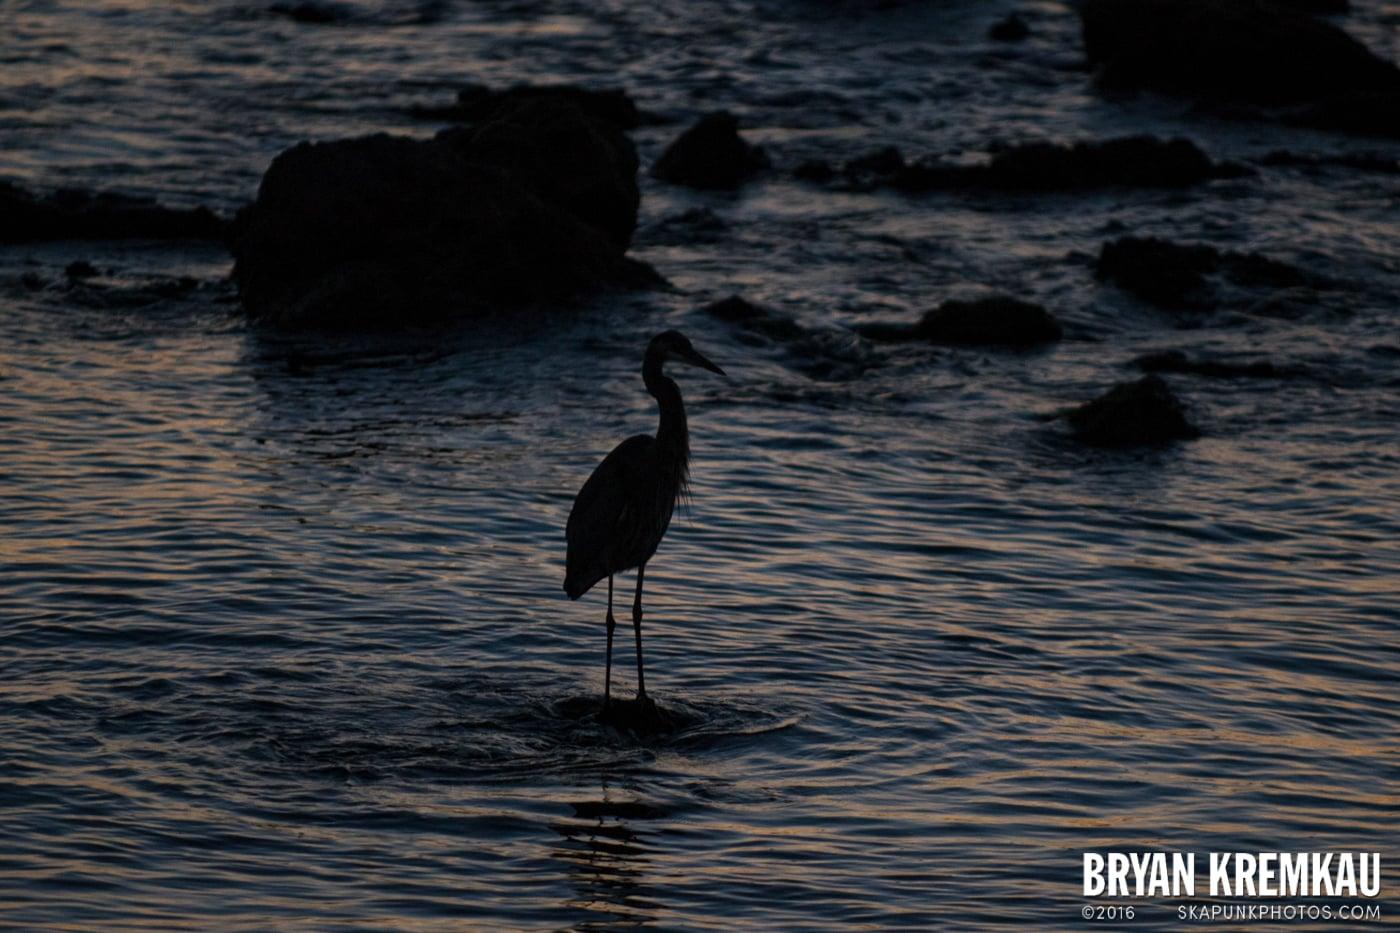 Sunsets, Astrophotography & Birds @ Venice, Florida - 10.25.14 - 11.5.14 (55)